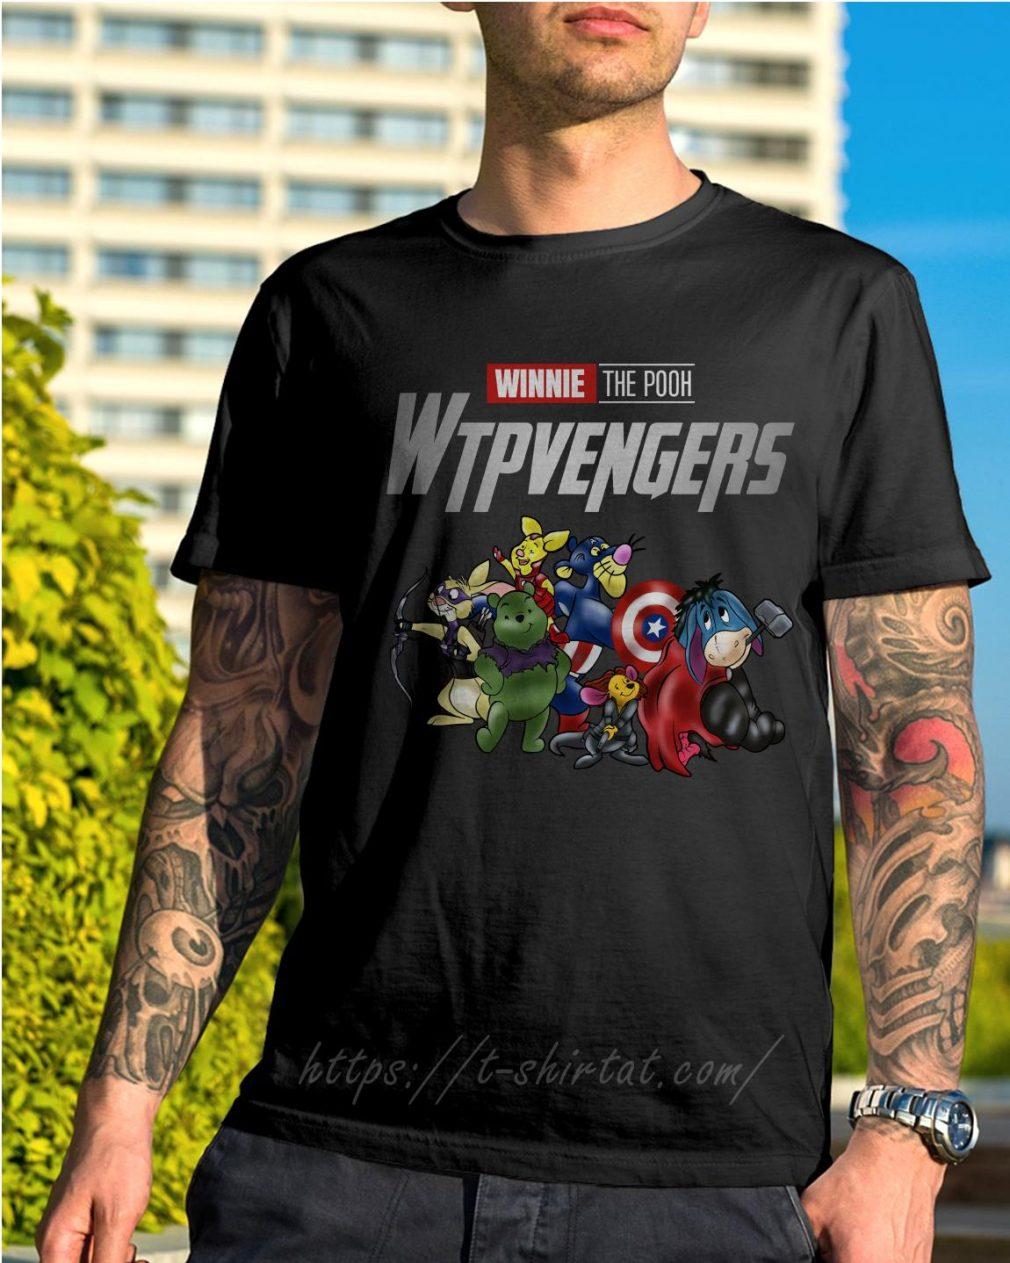 Marvel Winnie the Pooh Wtpvengers shirt